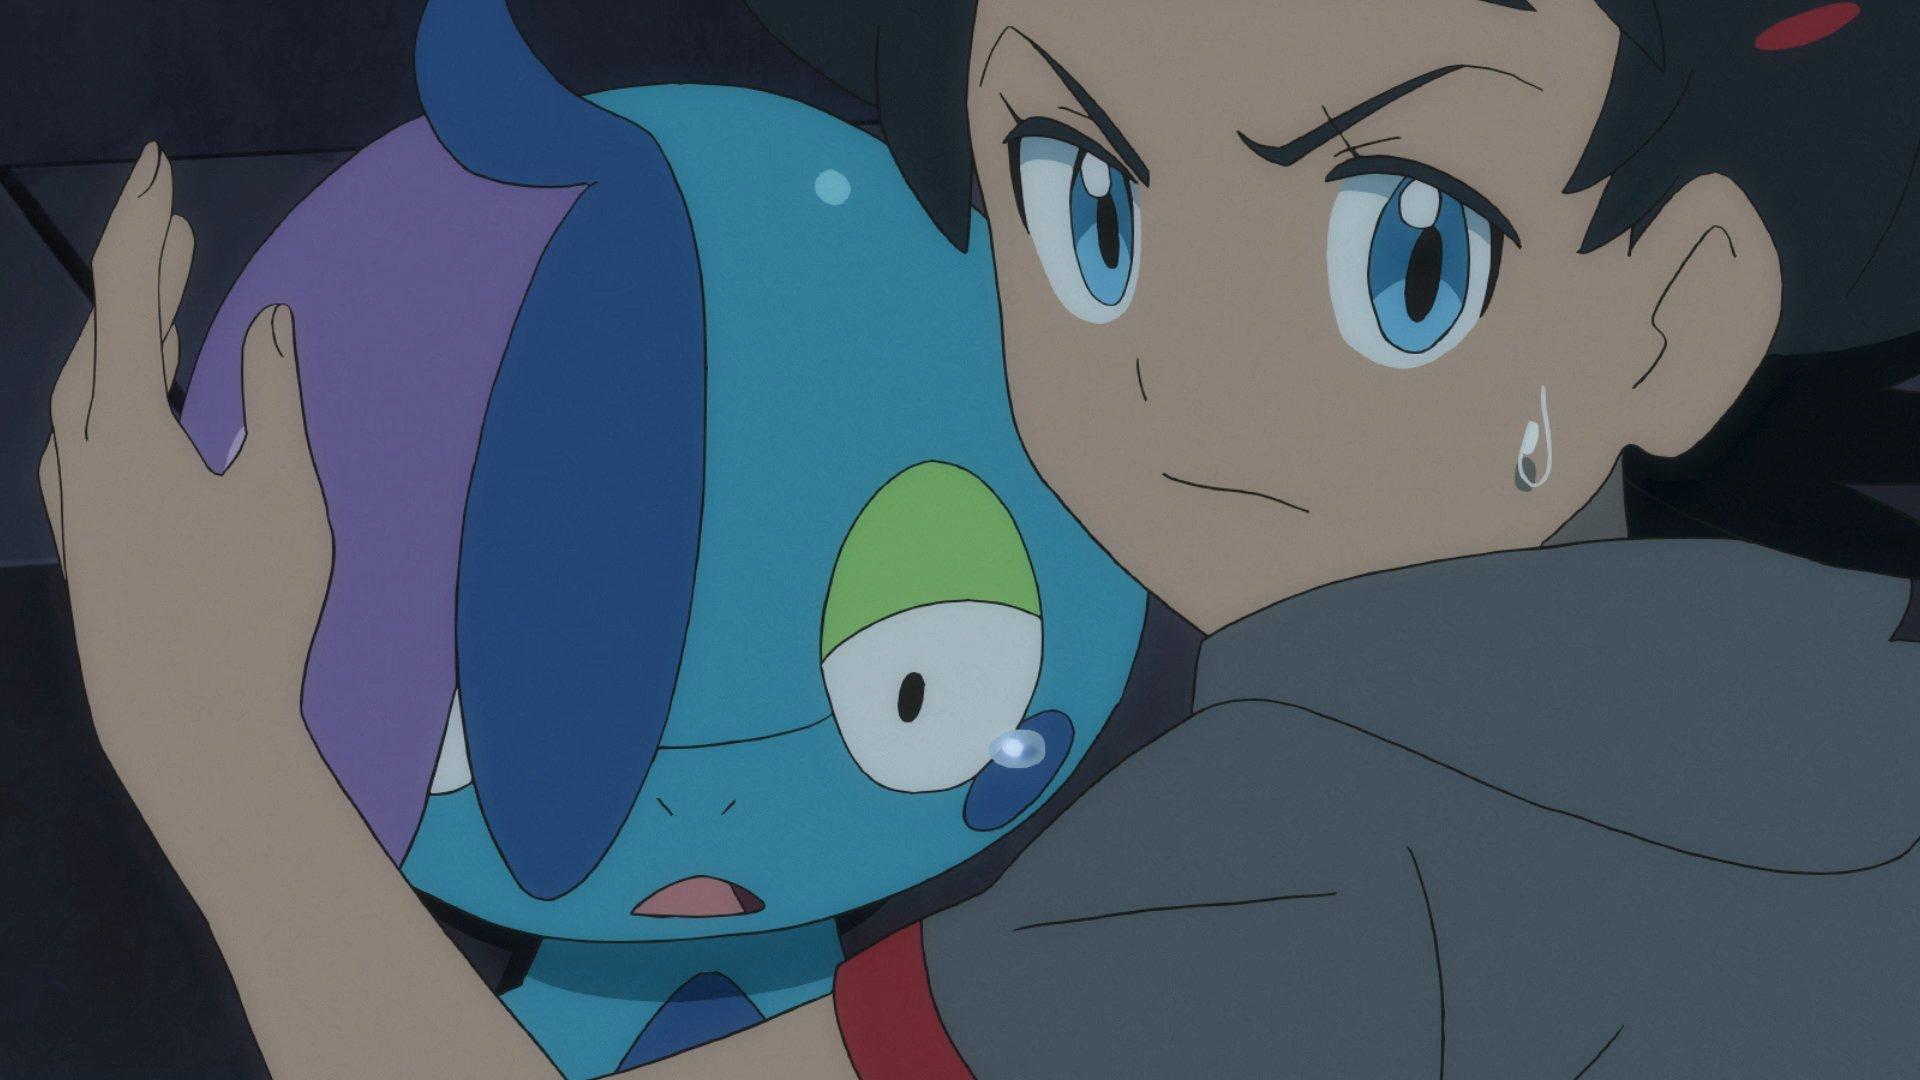 Capítulo Episodio 78 Pokémon Viajes